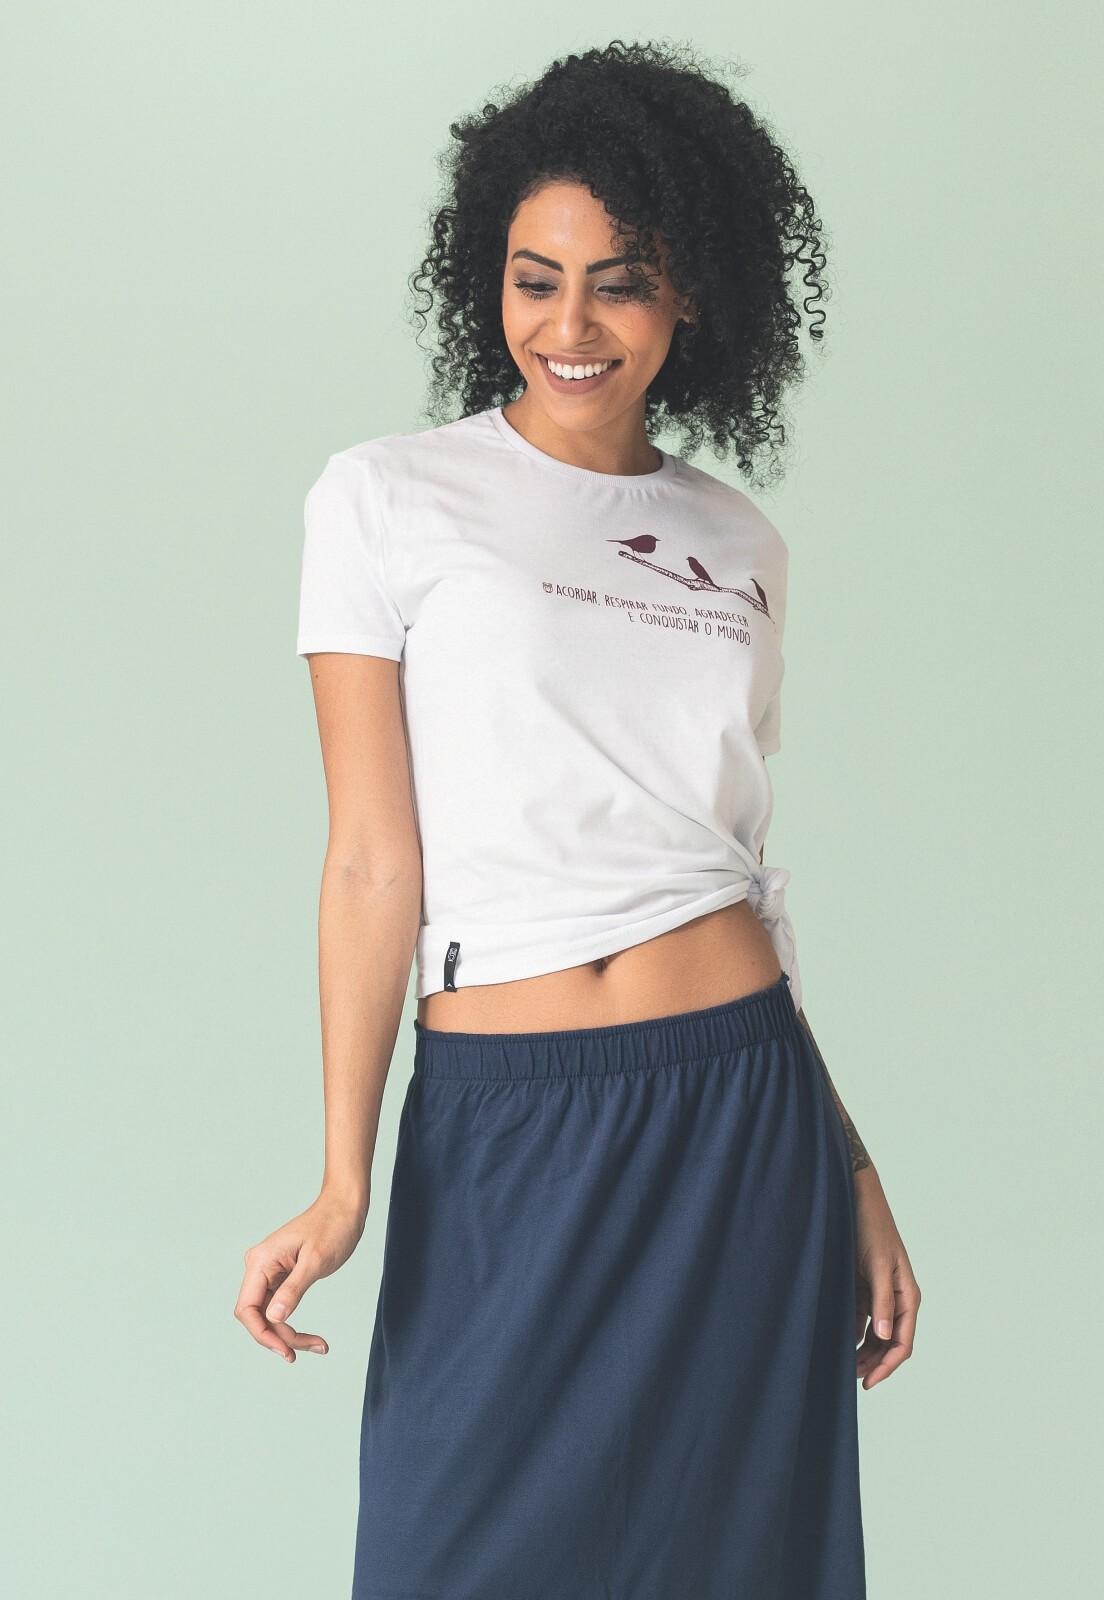 T-shirt Nogah Respirar Fundo Branca